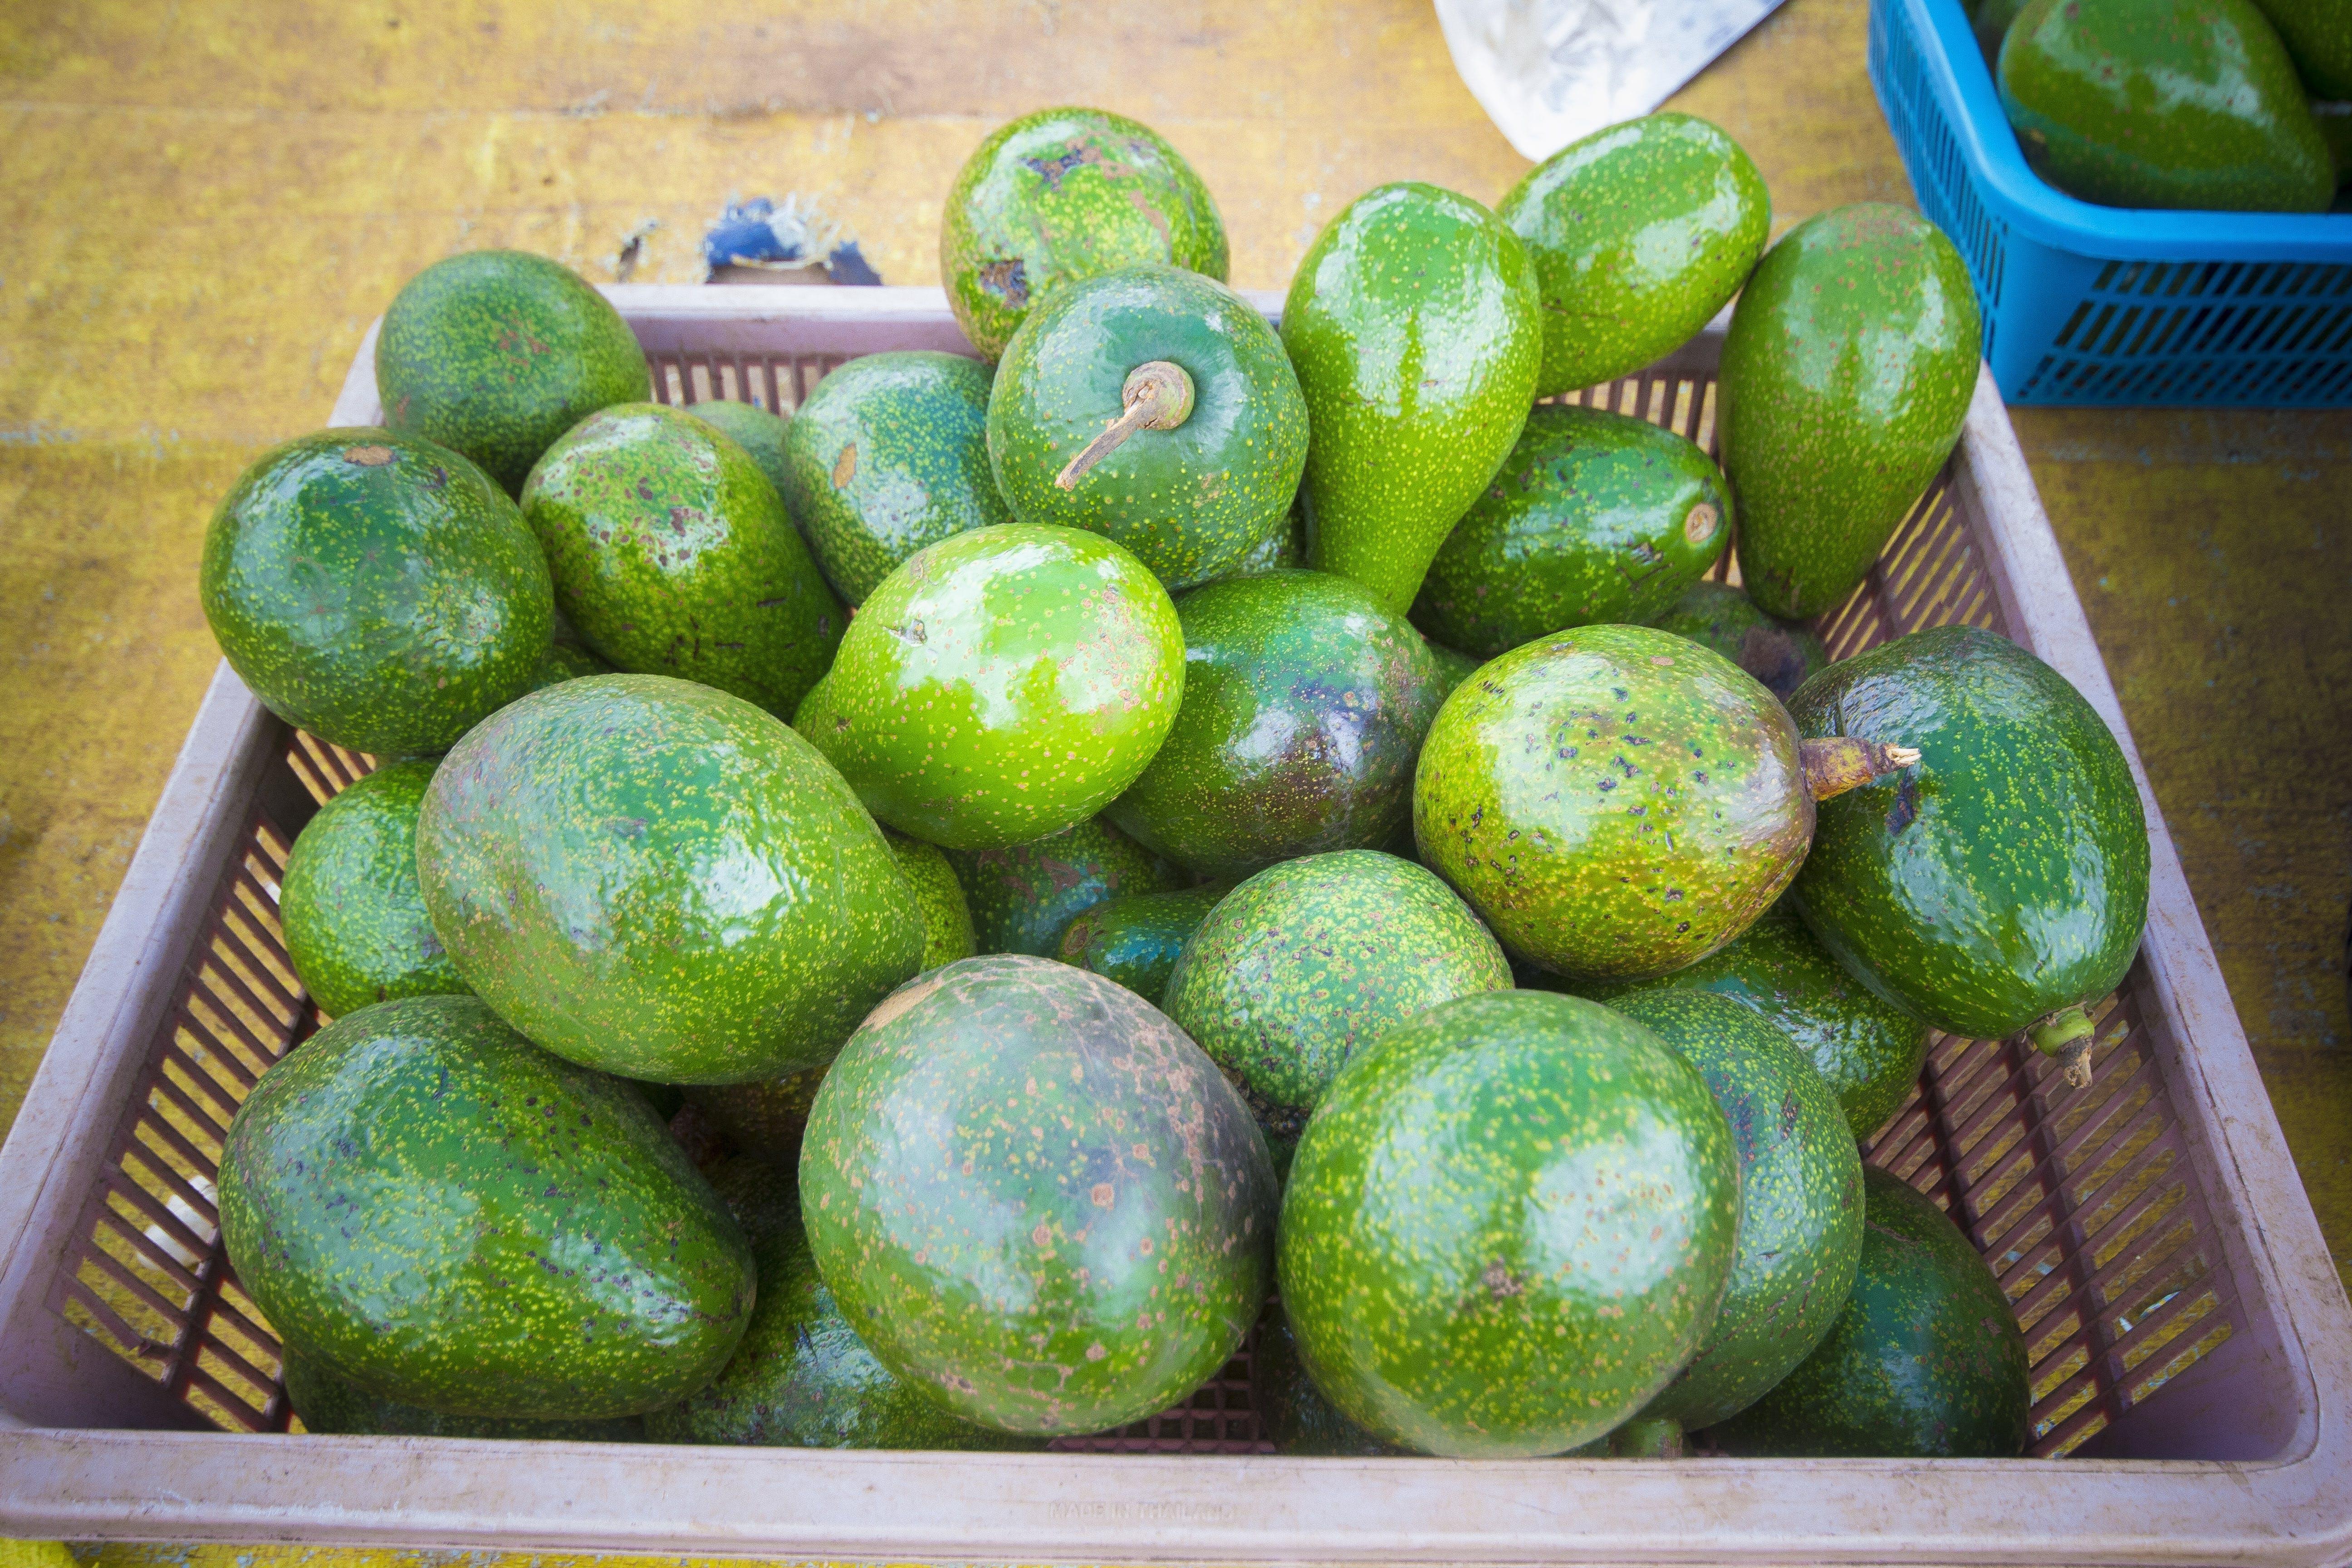 Rectangular Purple Plastic Basket Full of Green Avocado Fruits